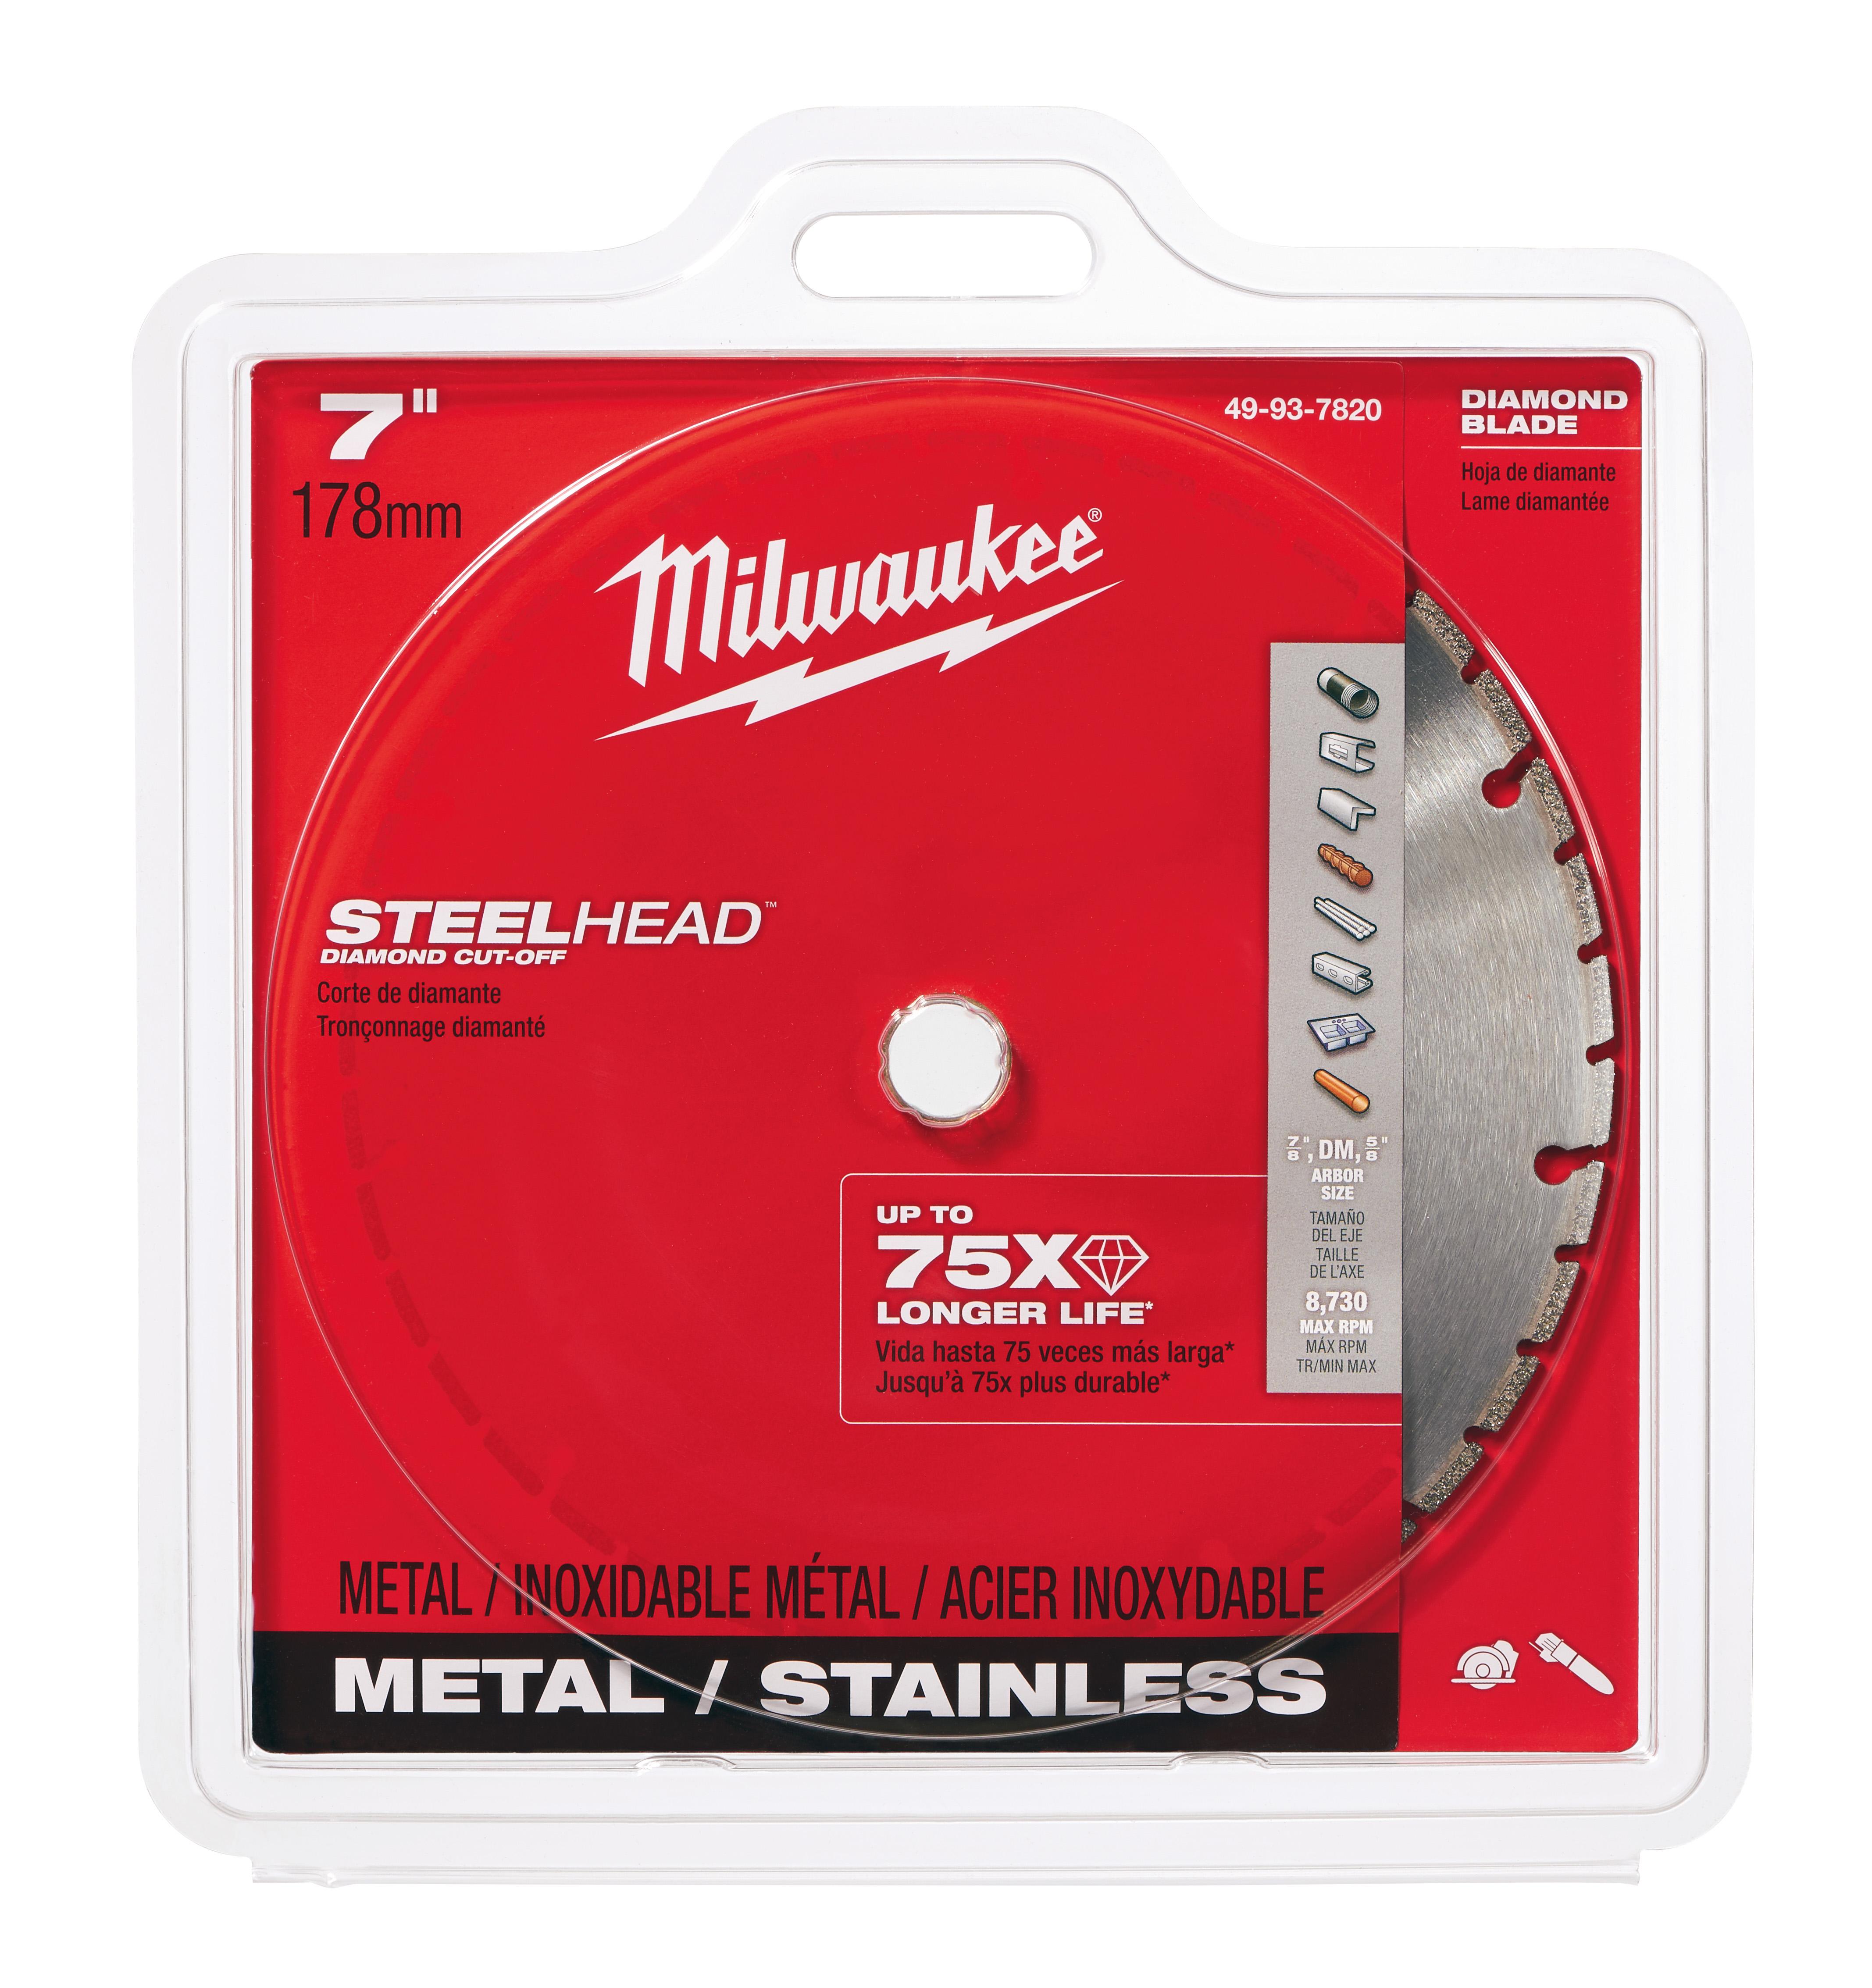 Milwaukee® SteelHead™ 49-93-7820 Segmented Diamond Cut-Off Blade, 7 in Dia Blade, 0.6 in W, 7/8 in, 5/8 in Arbor/Shank, Dry Cutting